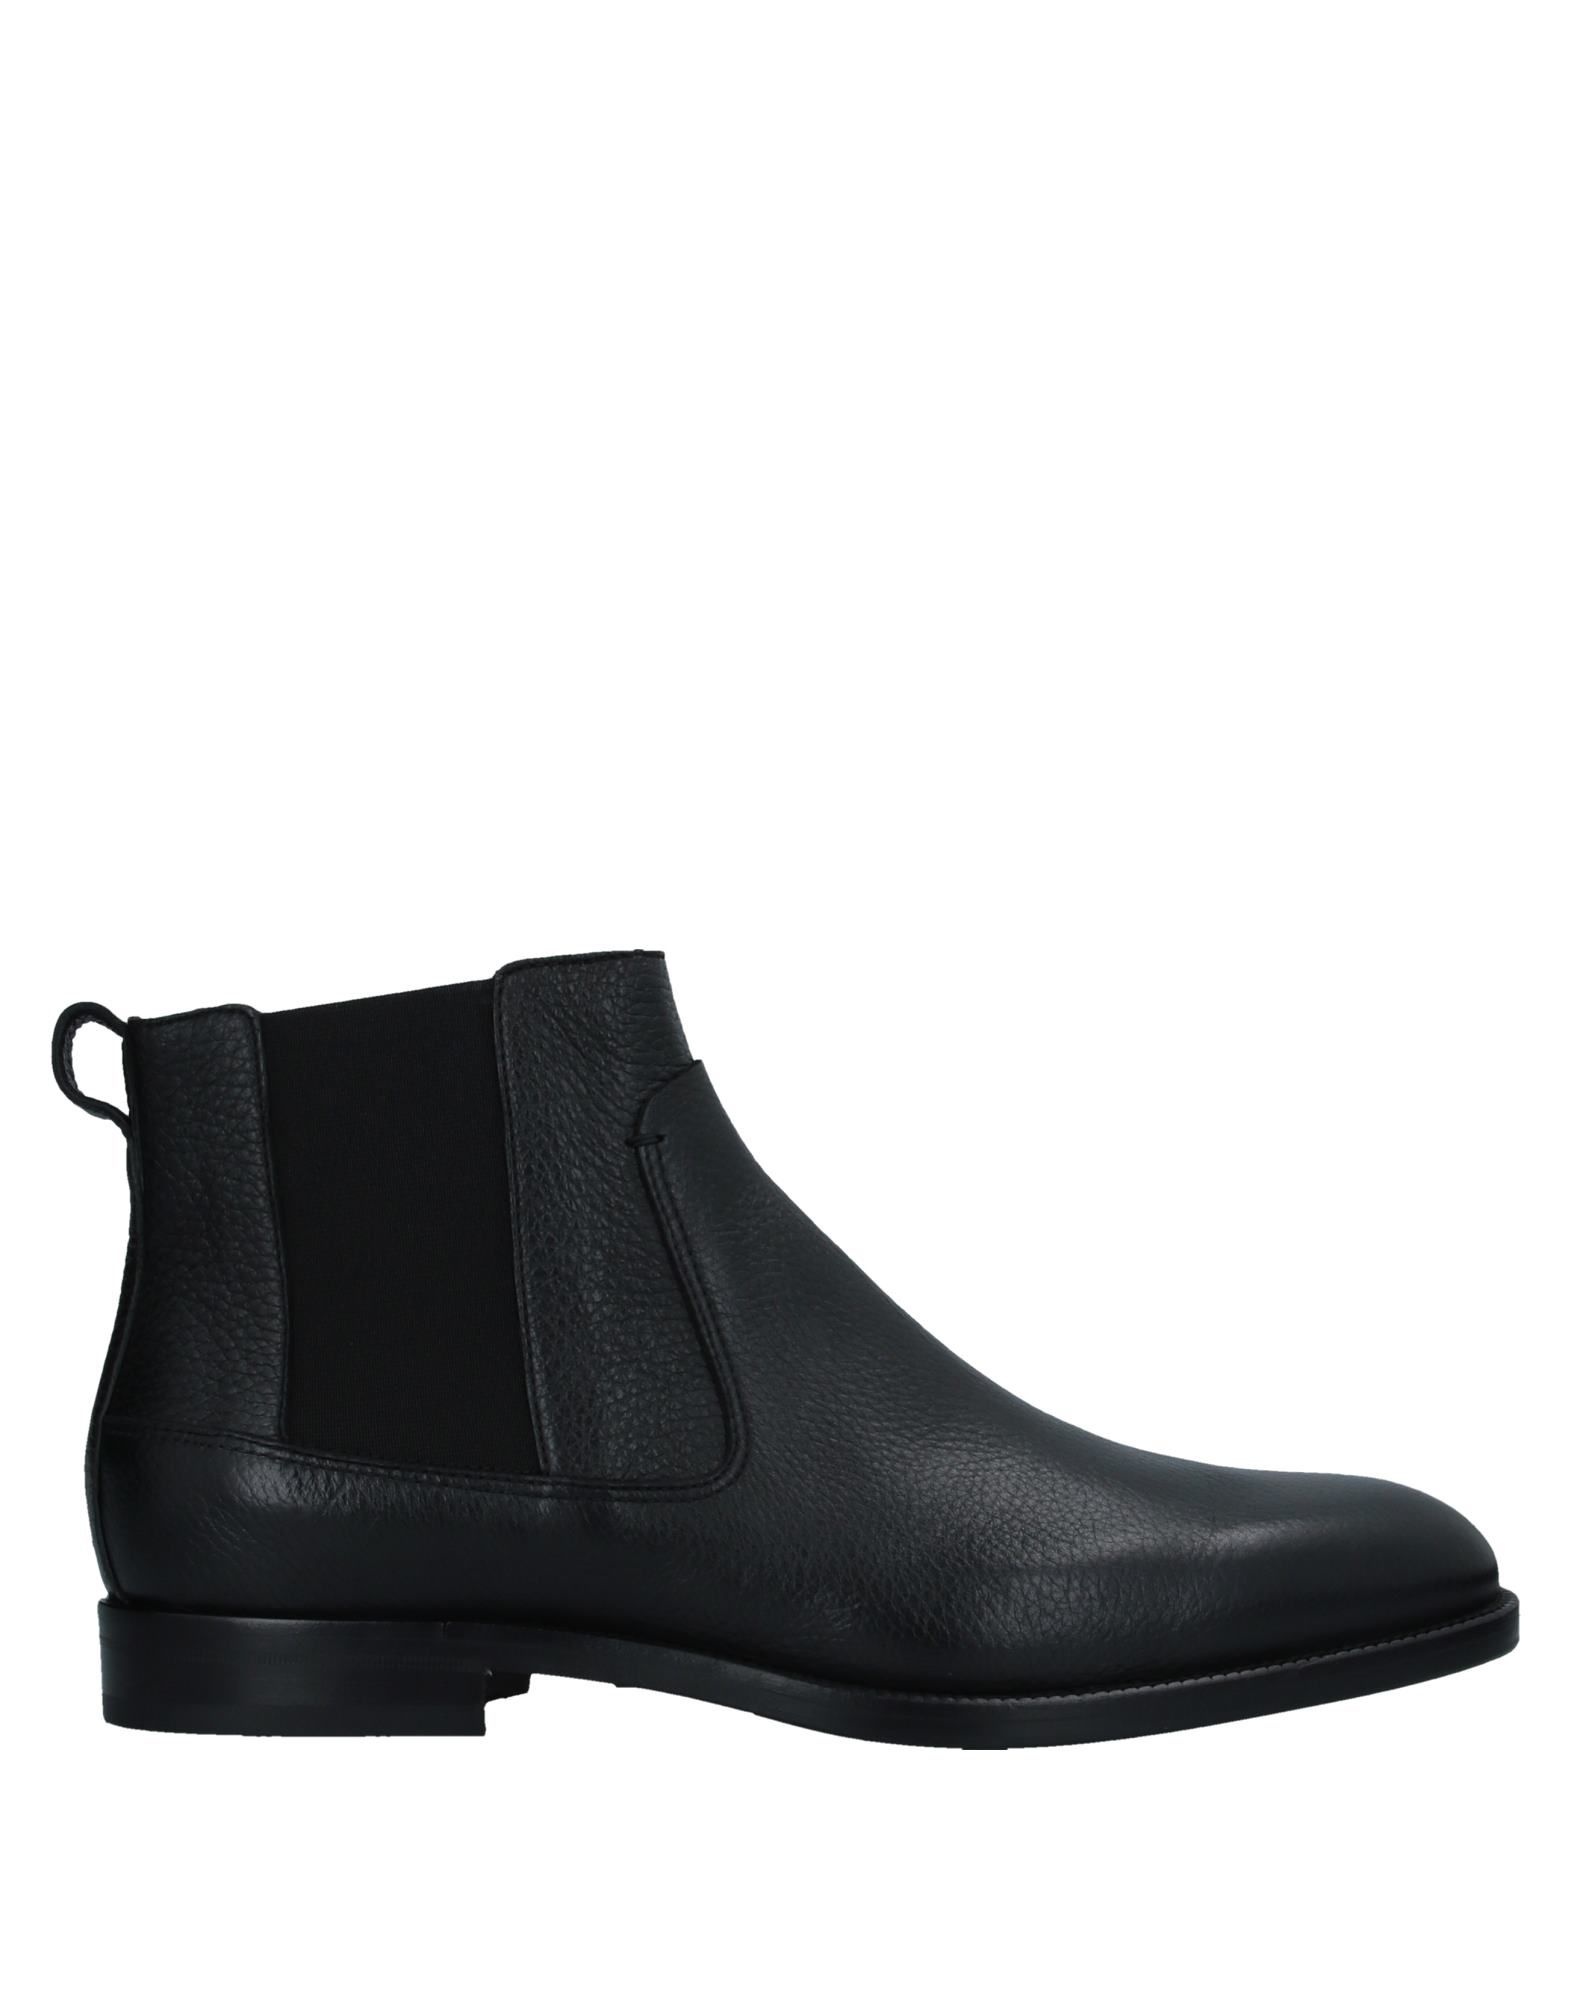 BRUNO MAGLI Полусапоги и высокие ботинки bruno bonelli полусапоги и высокие ботинки